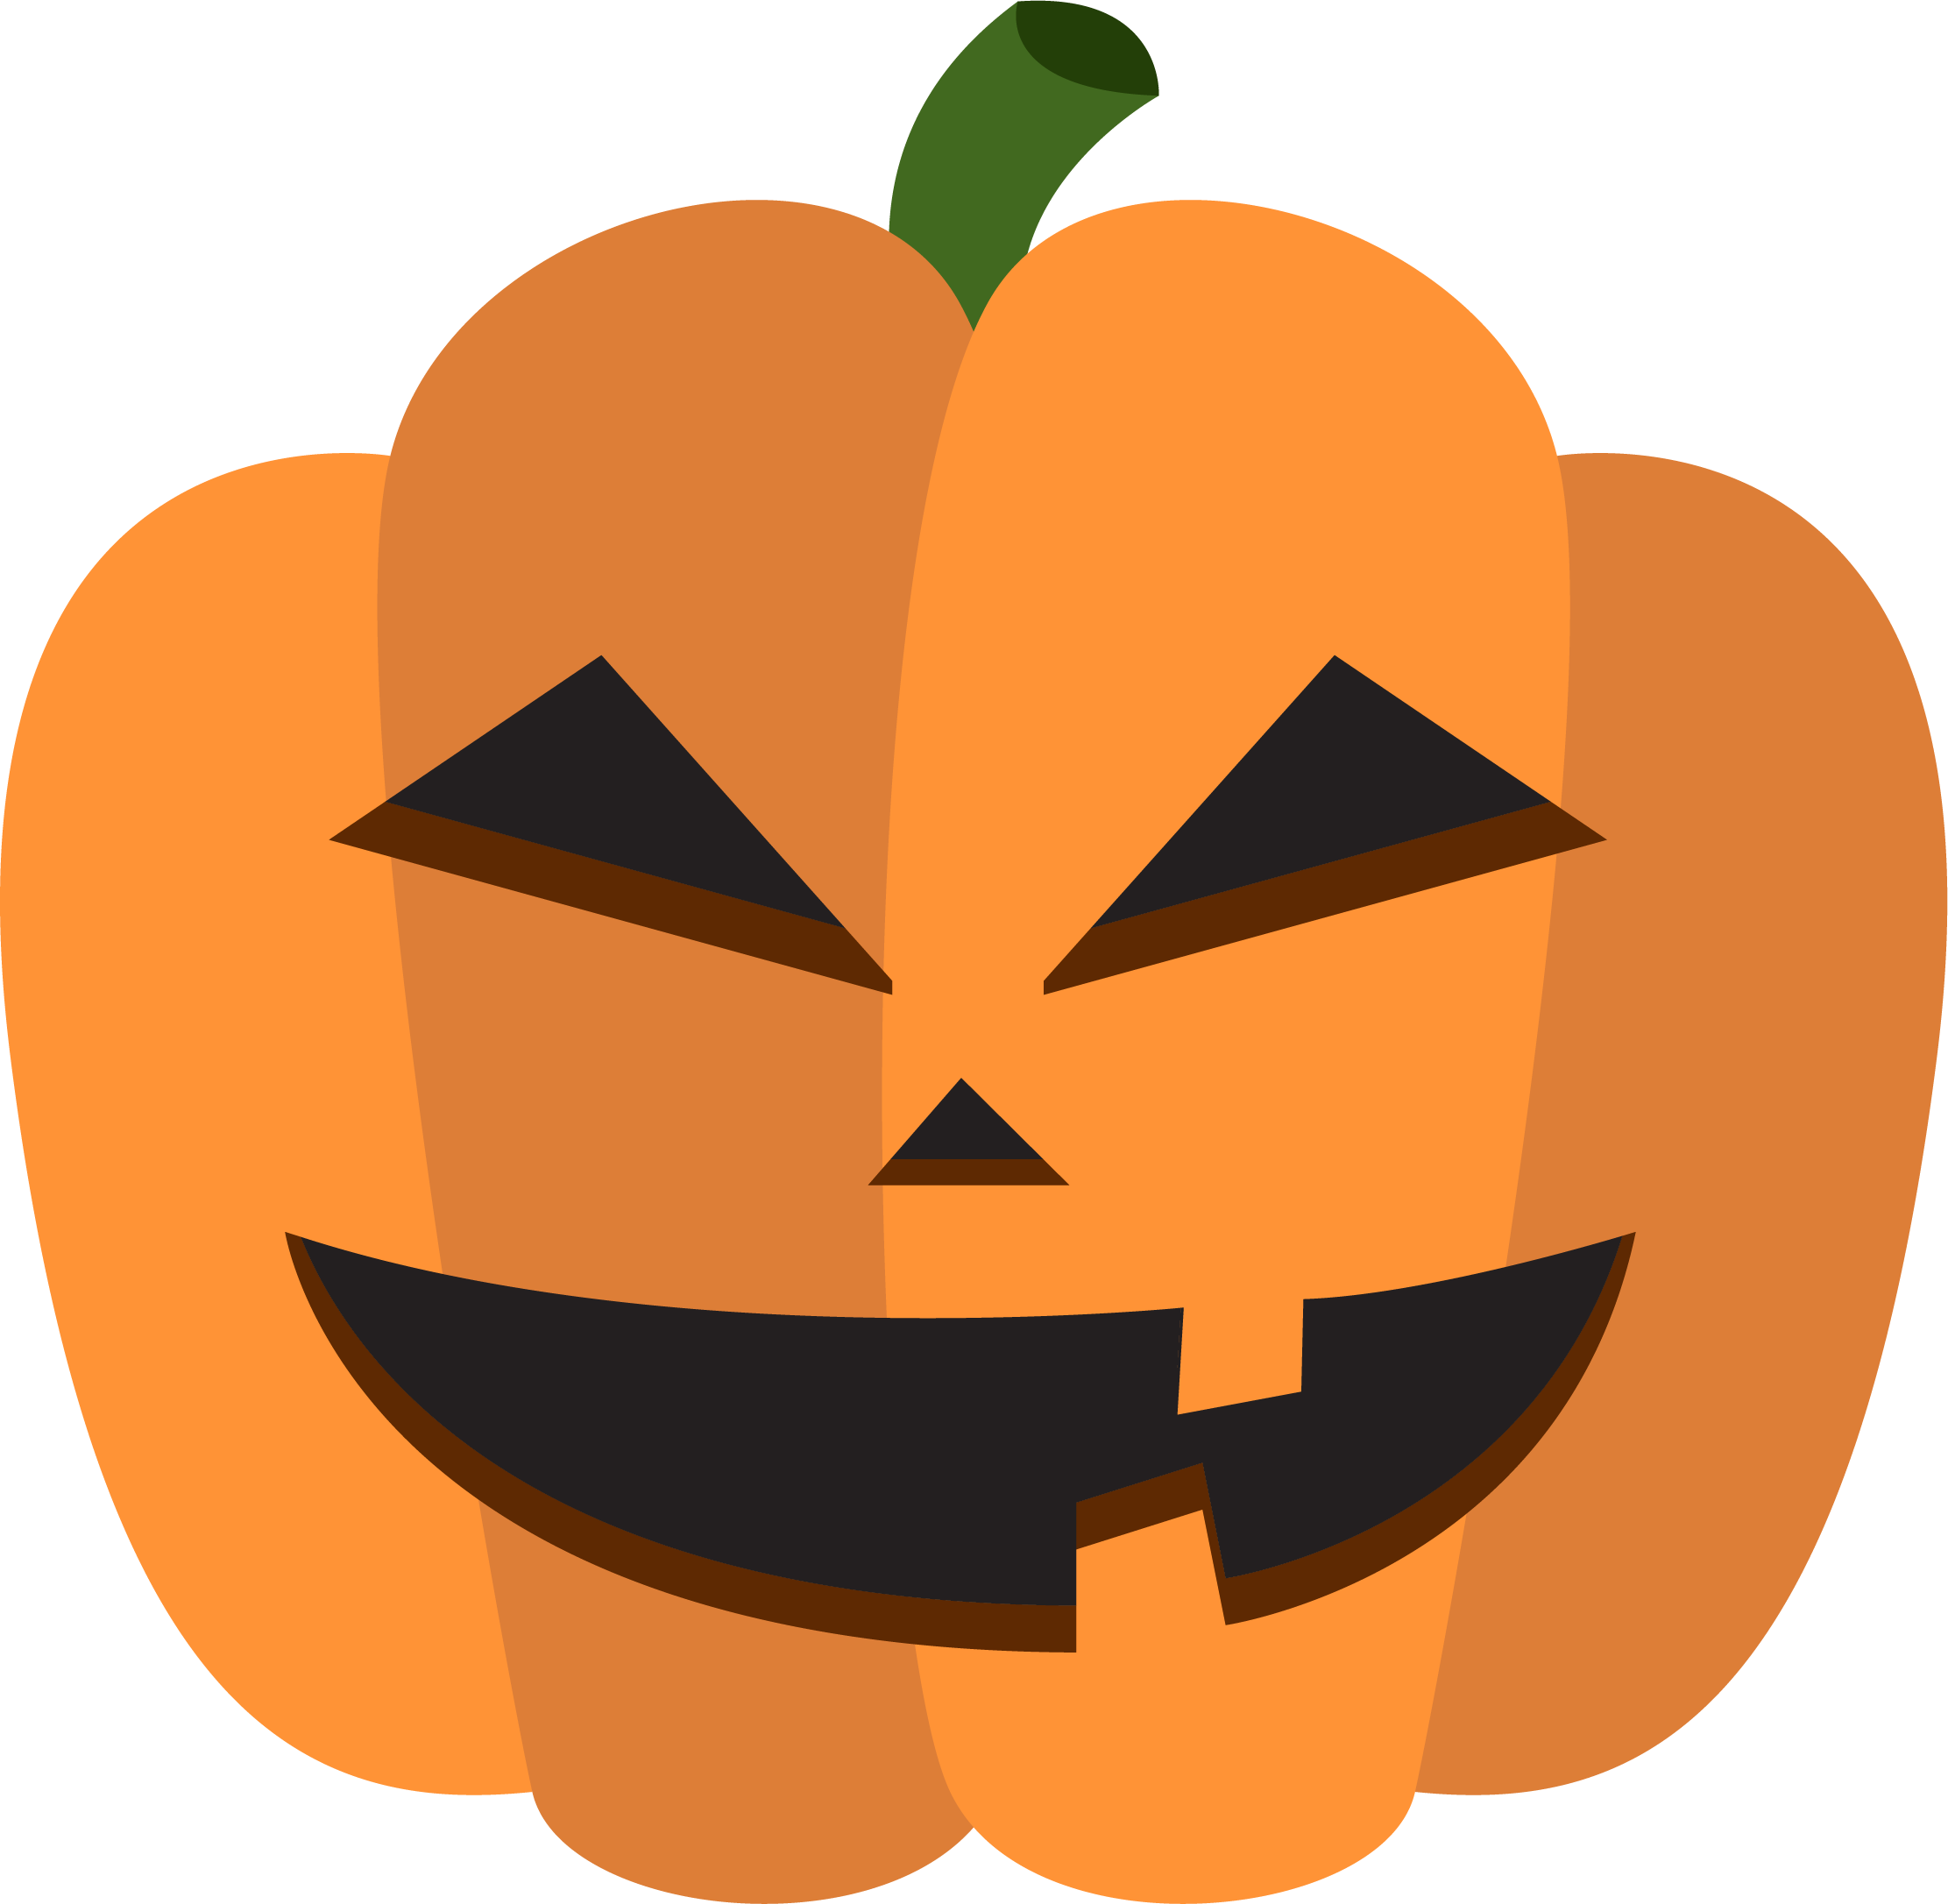 Pumpkin clipart pumpkin decorating. Calabaza halloween decoration cartoon